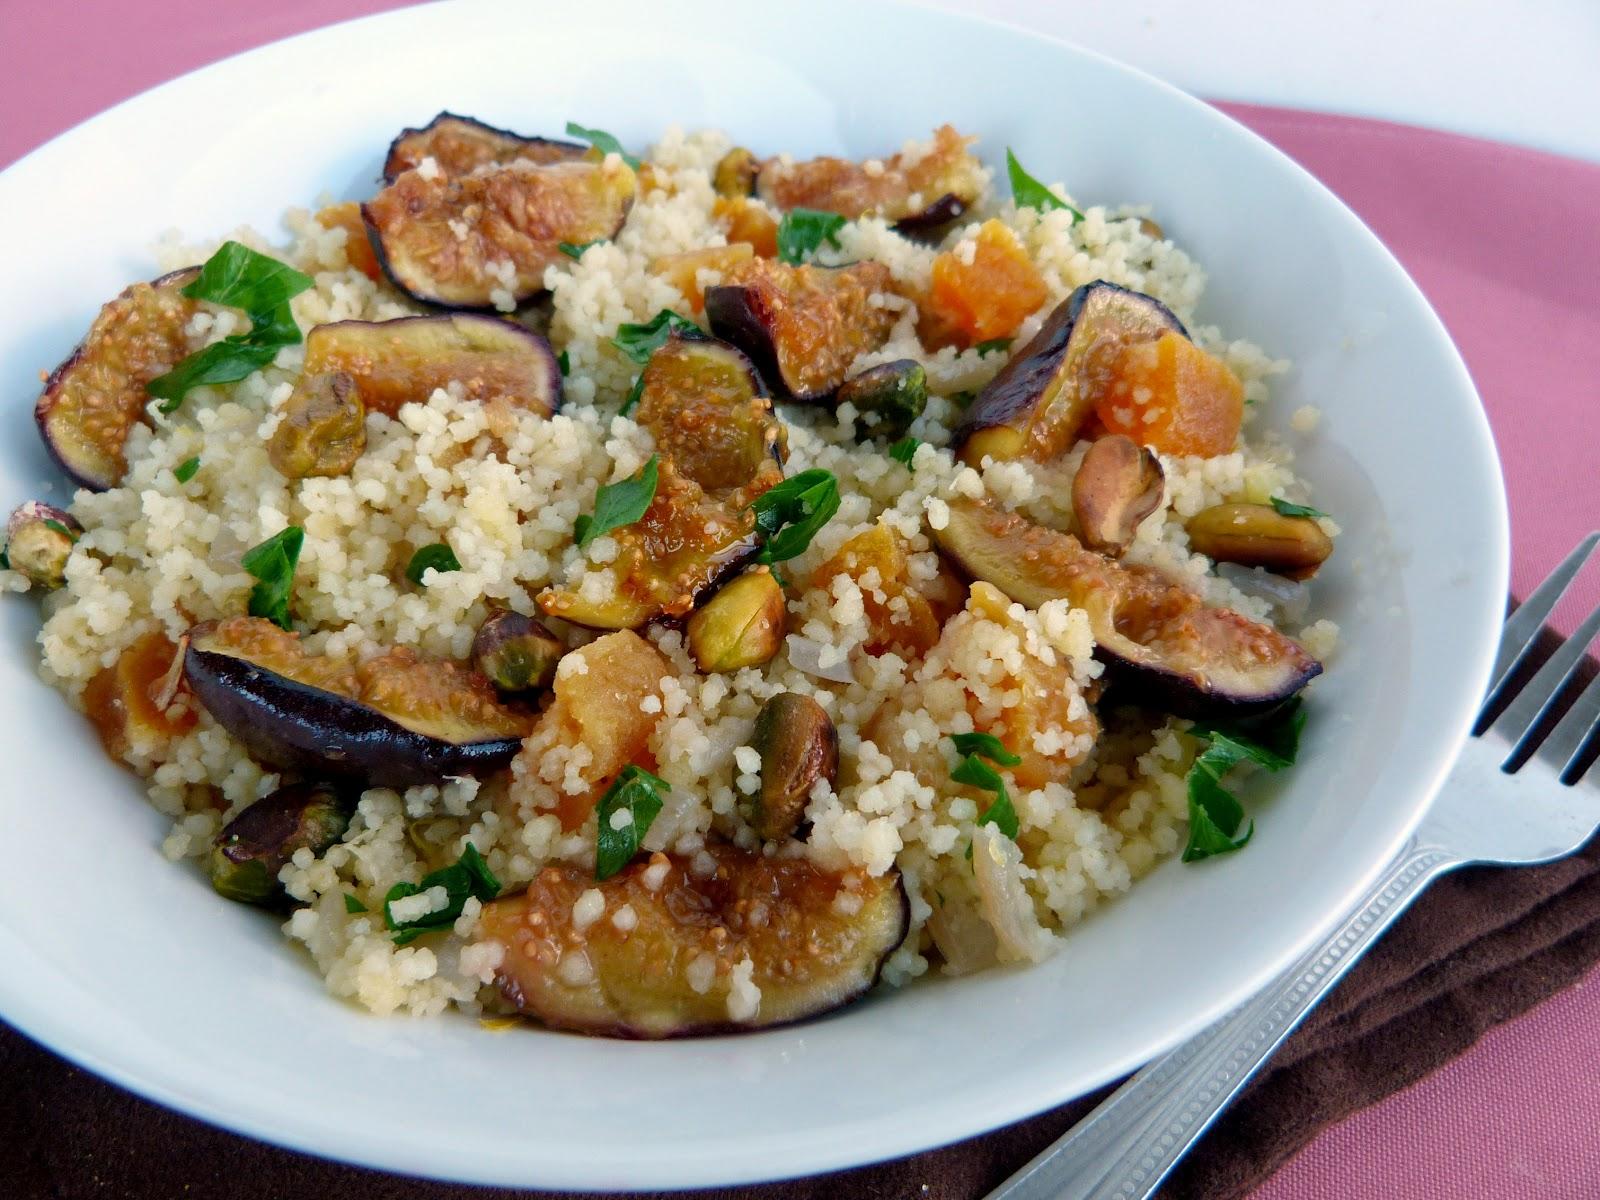 Vanilla & Spice: Couscous with Figs, Apricots & Pistachios